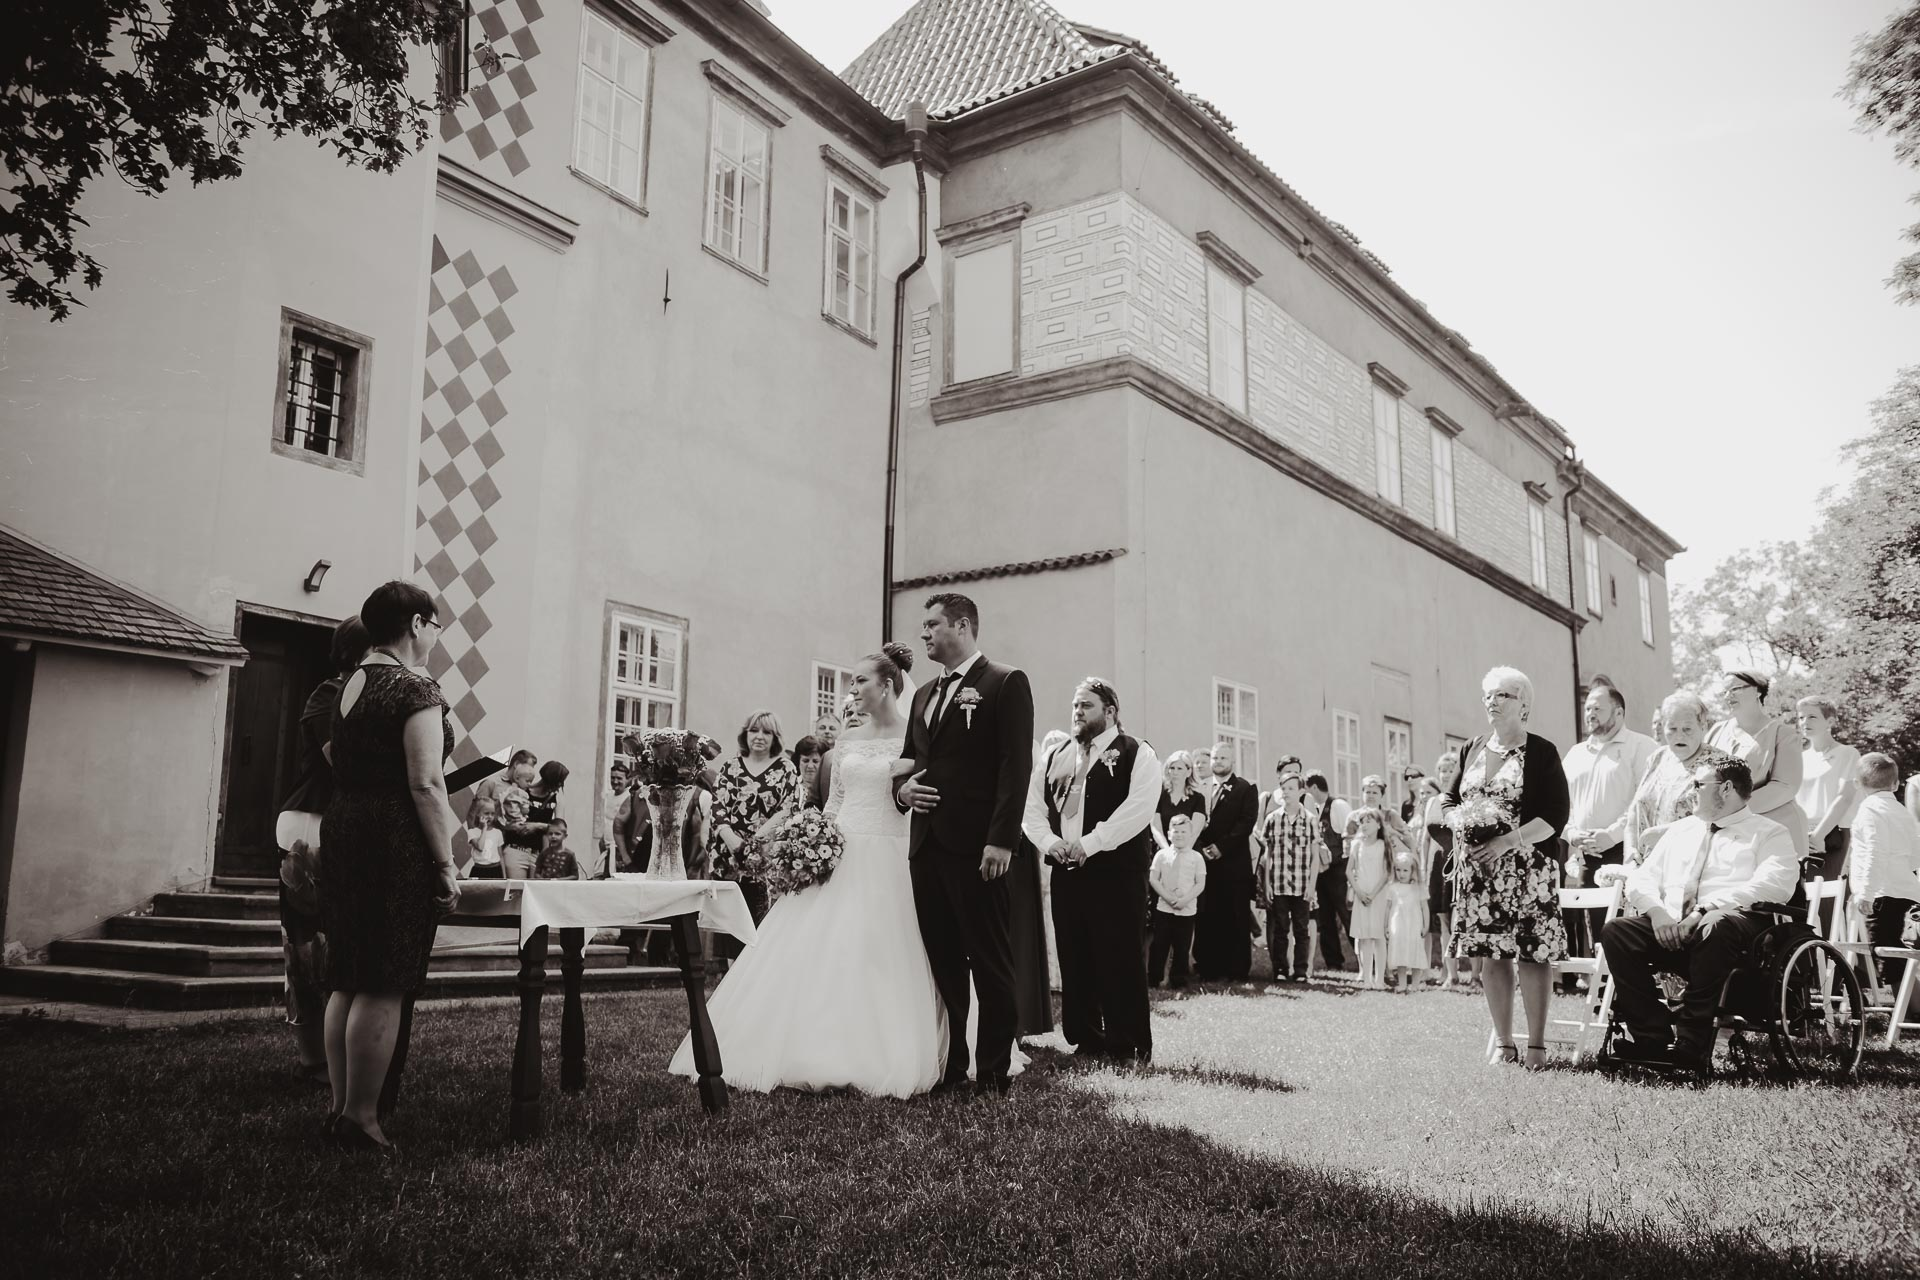 svatebni-fotografie-zamek-Brandys-nad-Labem-1166